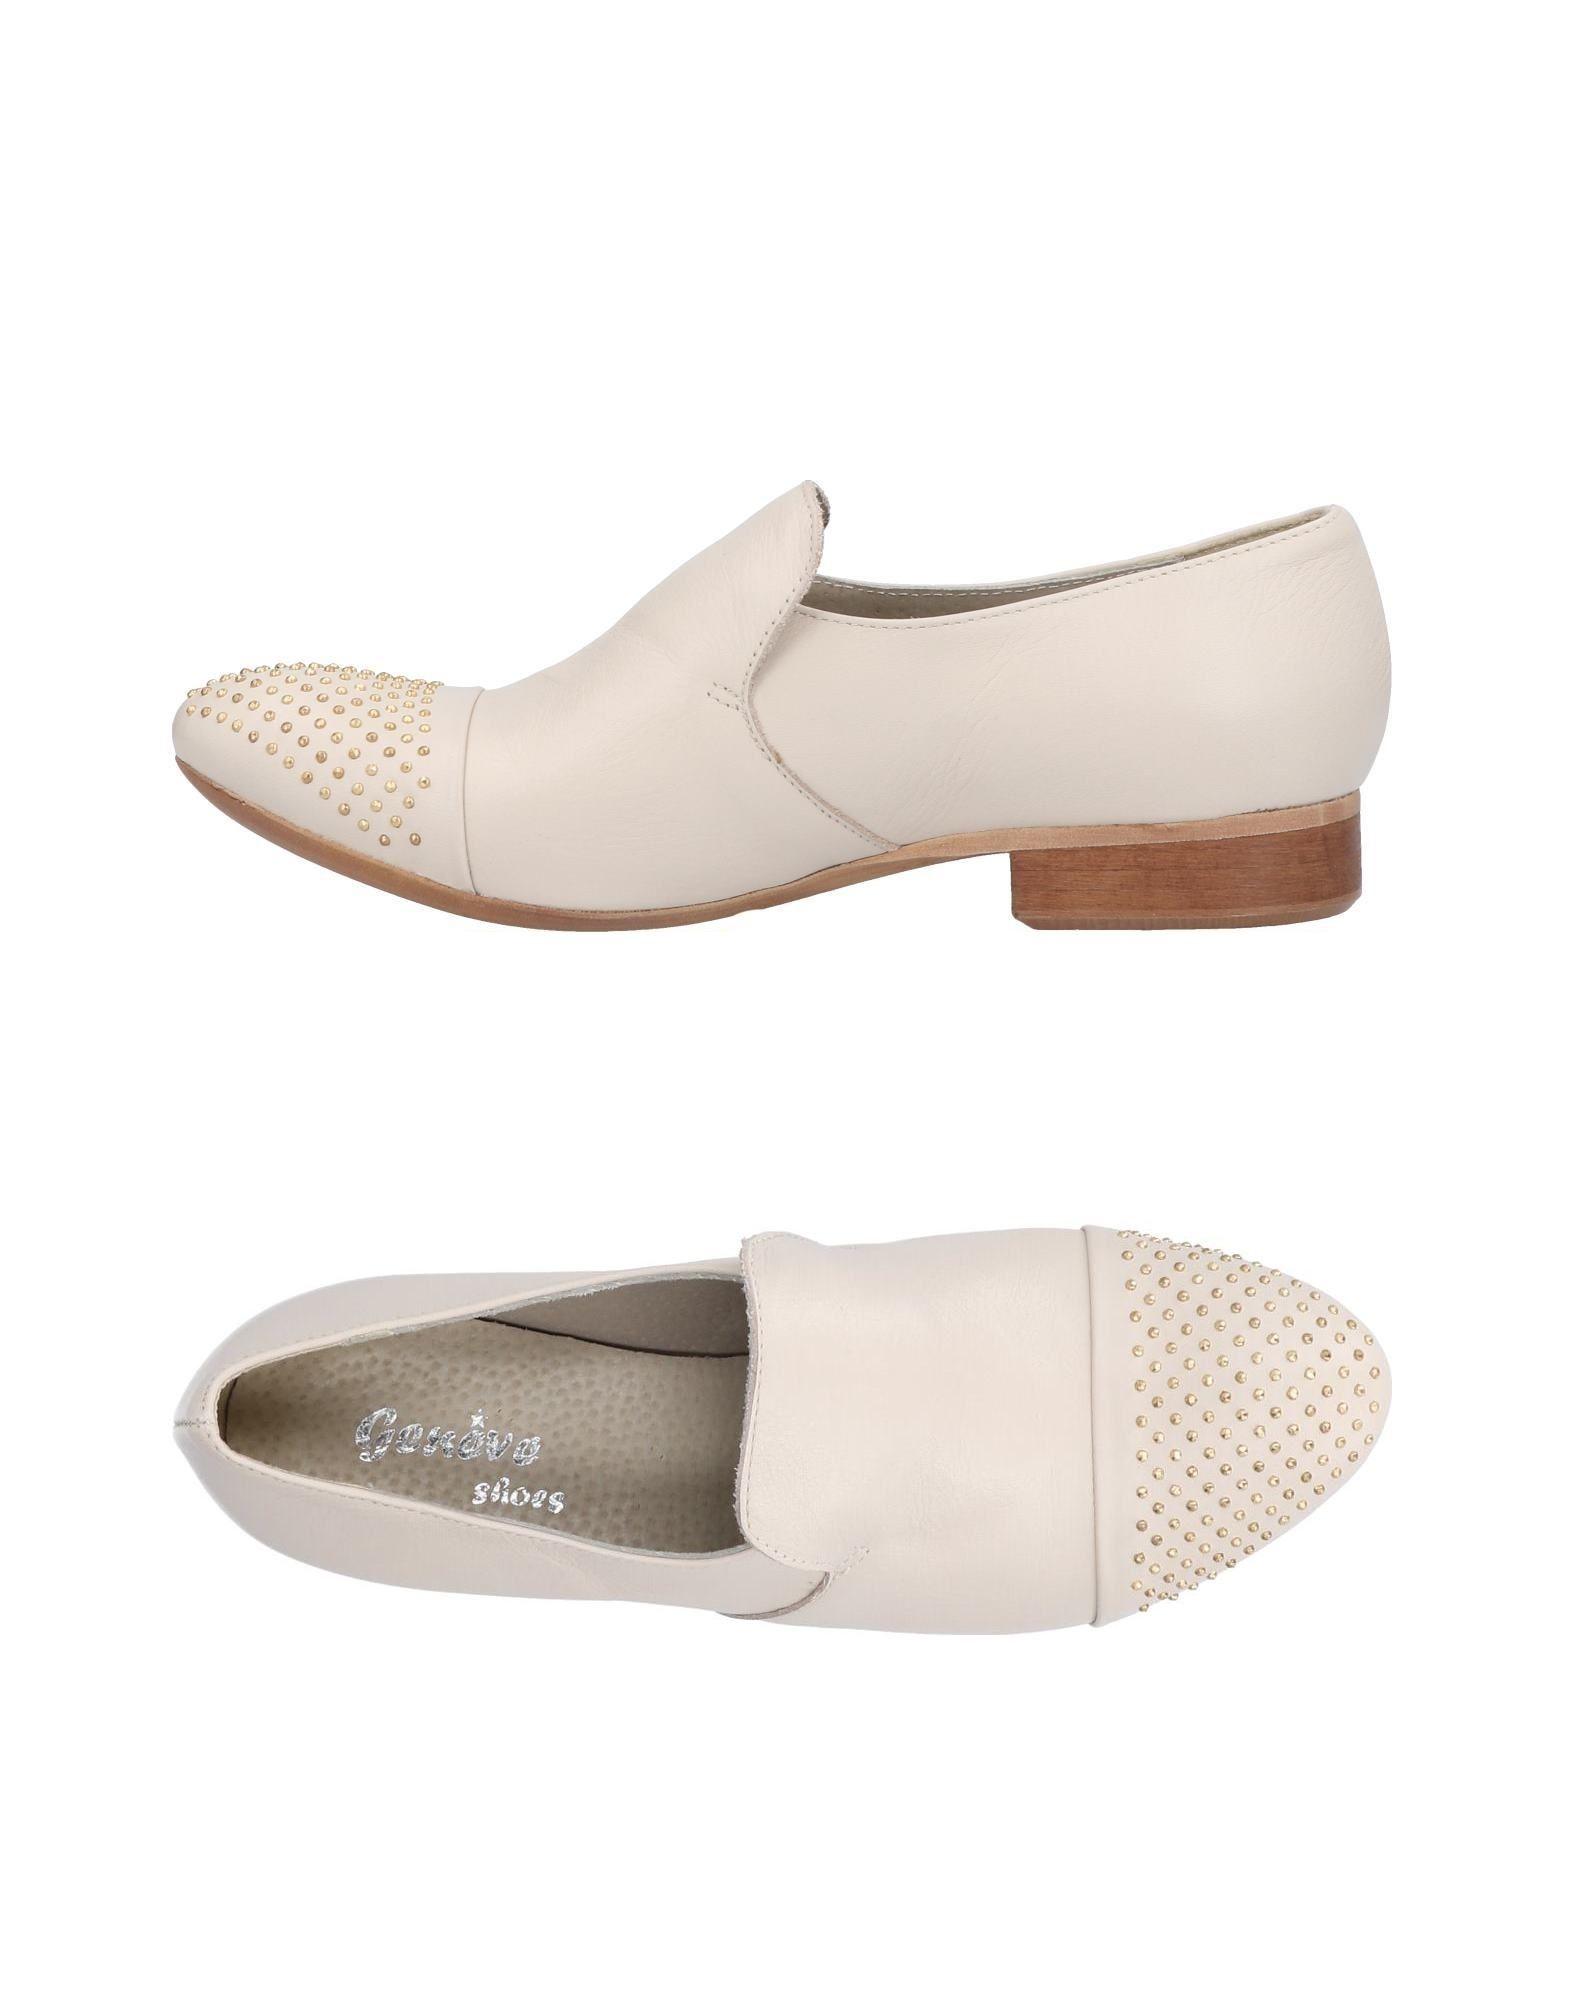 Geneve Mokassins Damen  11467717UF Gute Qualität beliebte Schuhe